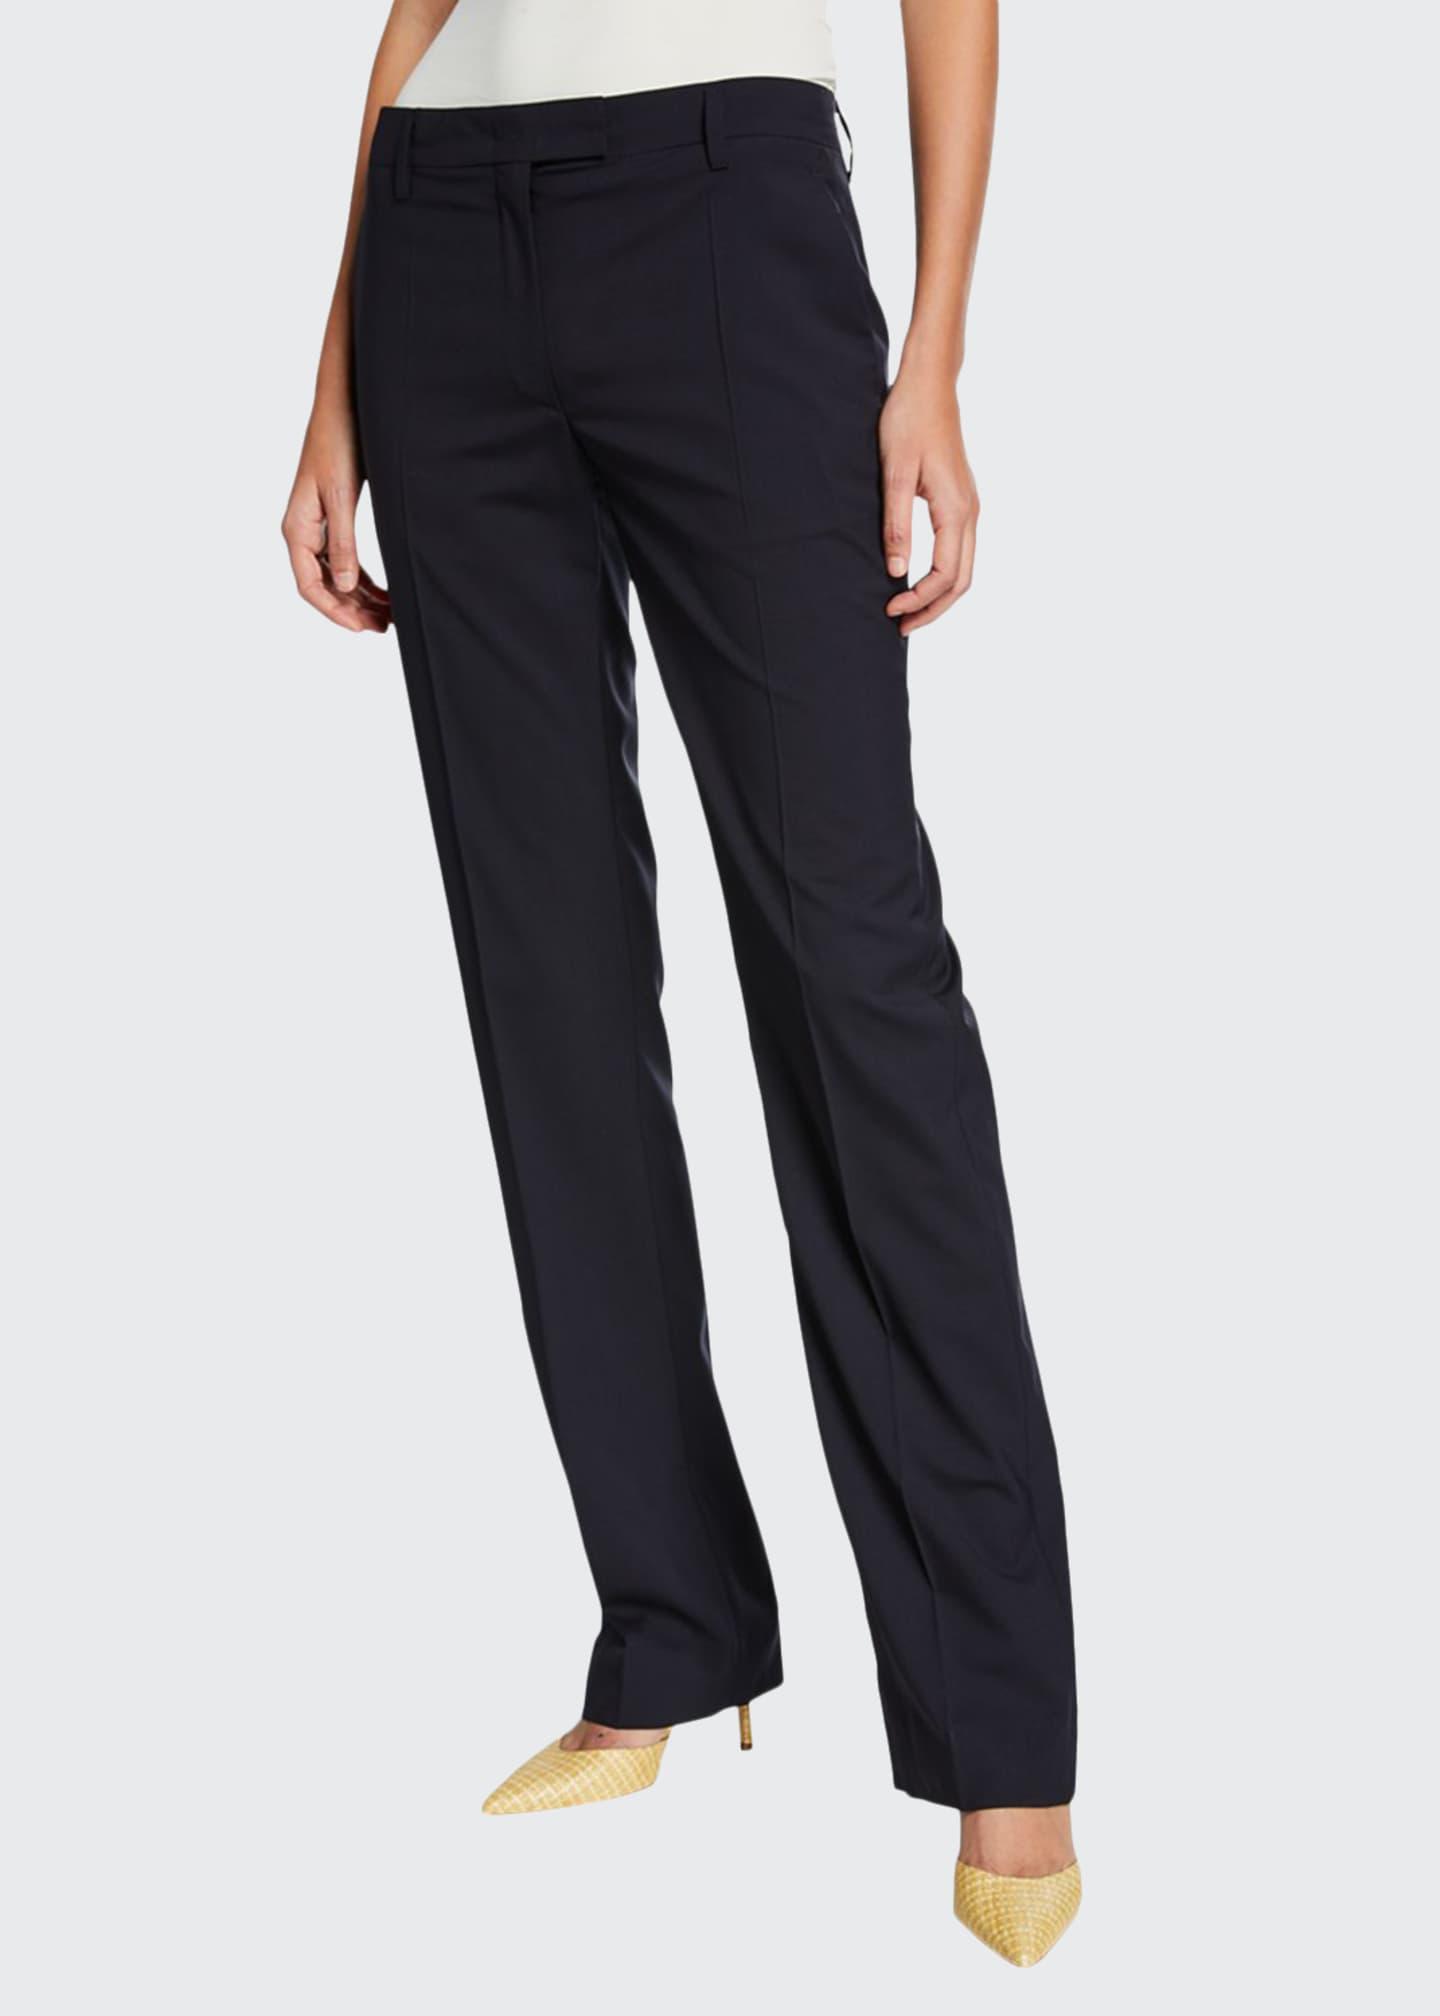 Prada Lightweight Wool Straight-Leg Pants